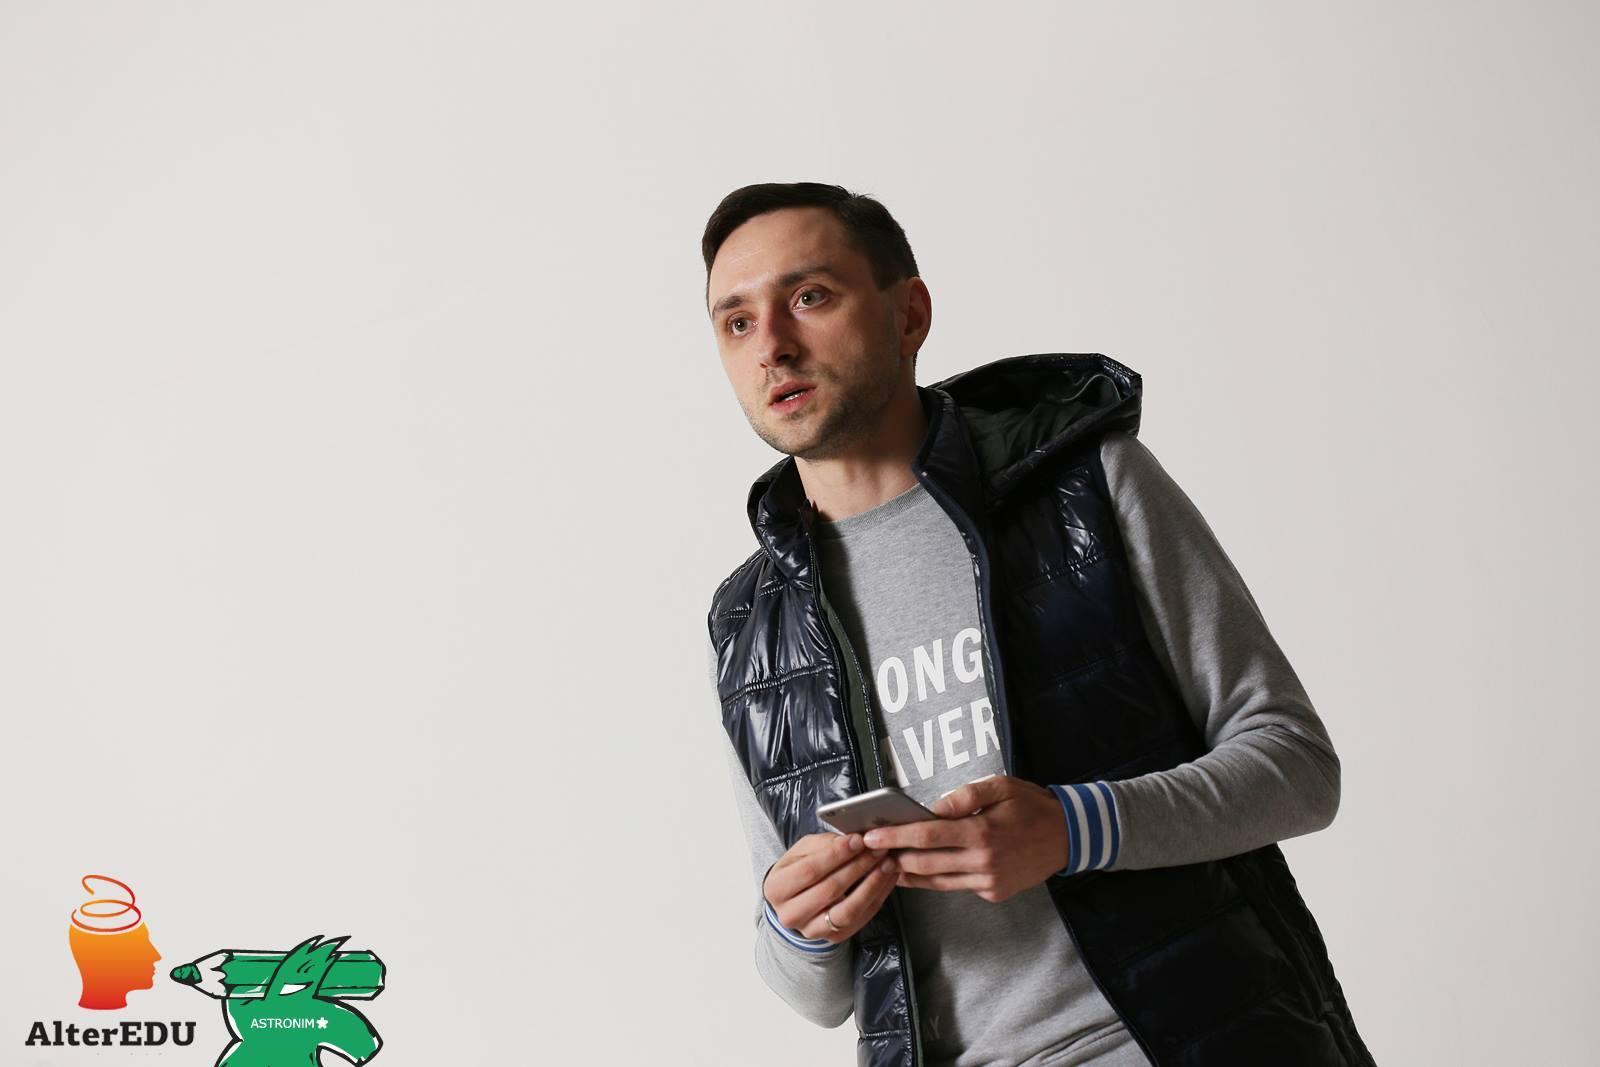 Вадим Скротский. AlterEDU by HeadMade Group & Astronim